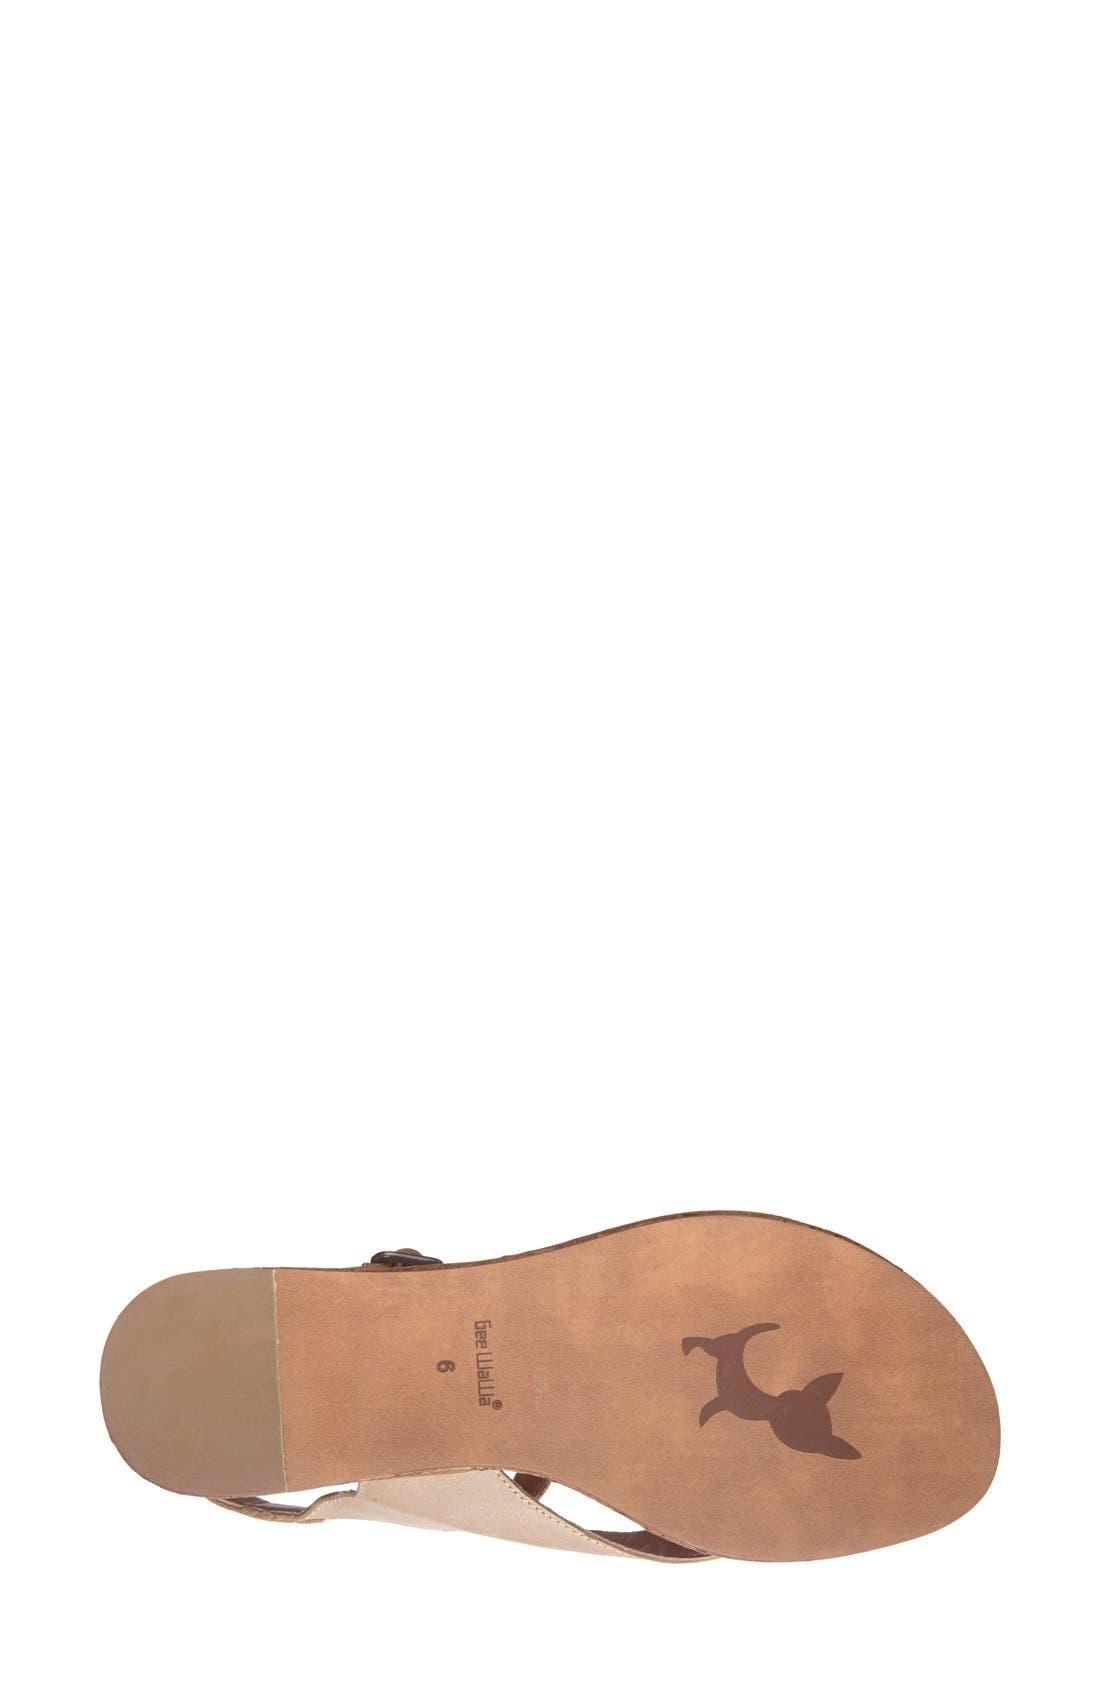 Alternate Image 4  - Gee WaWa 'Montana' Leather Sandal (Women)